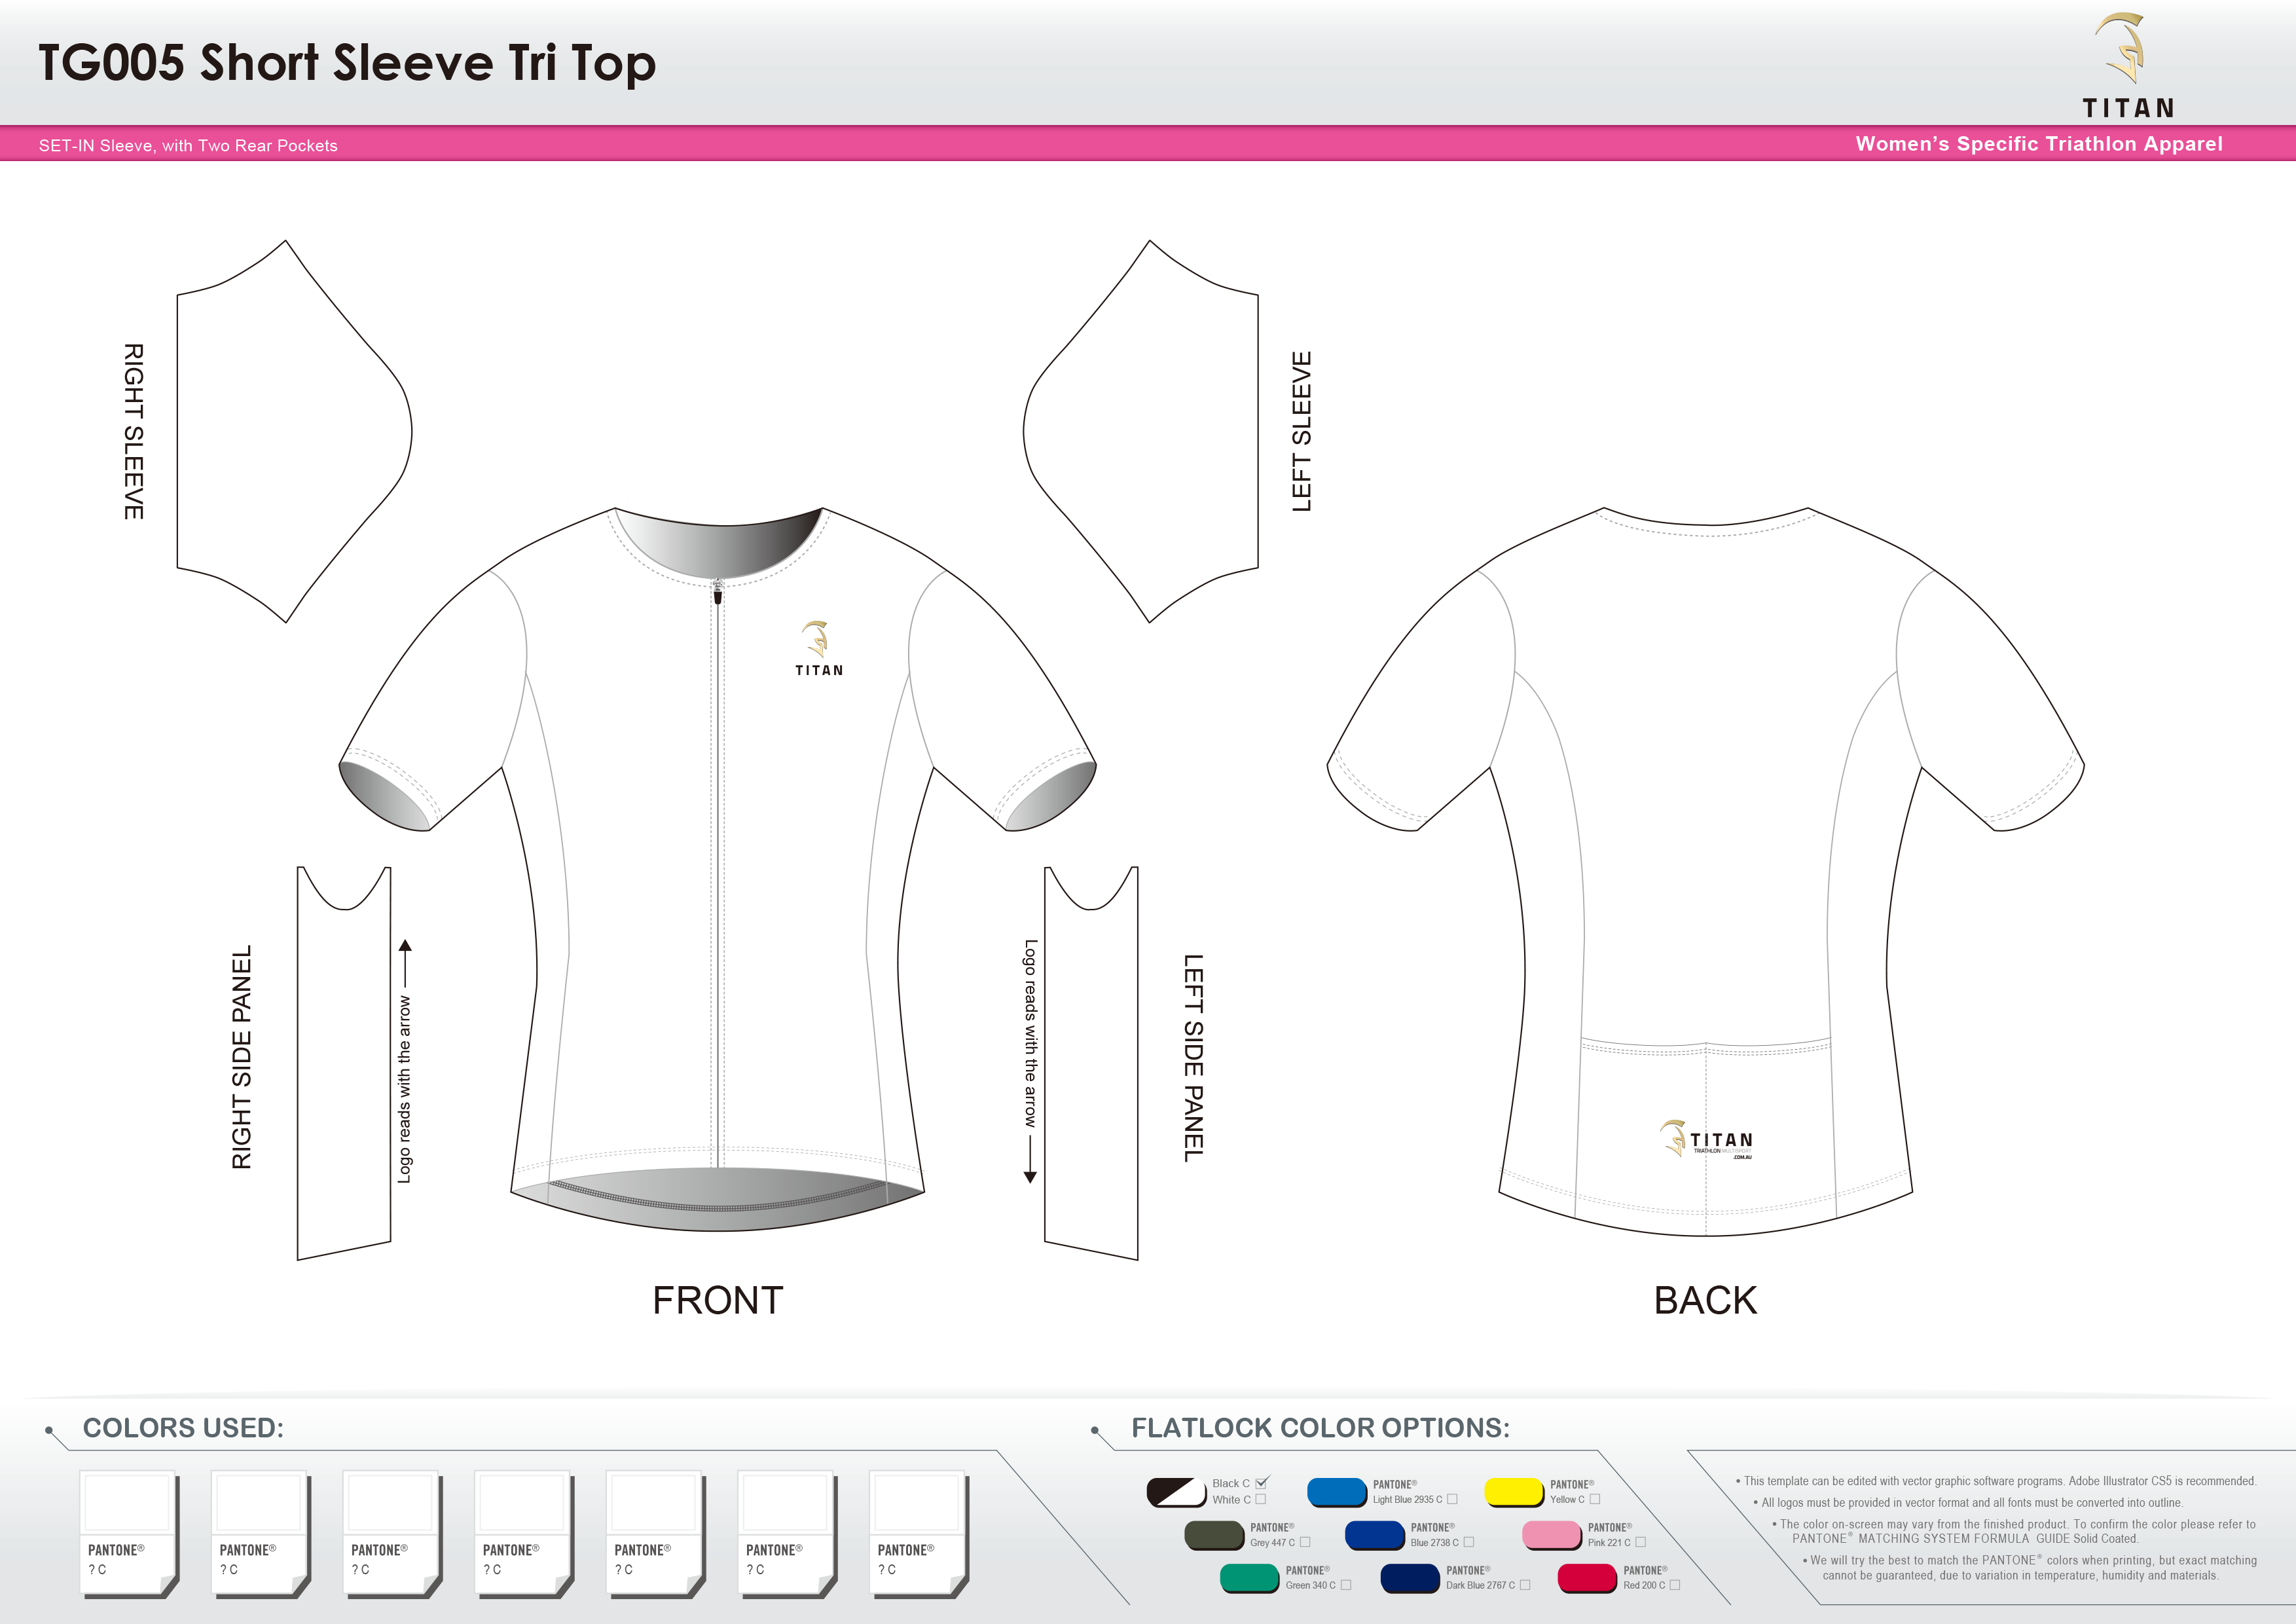 TG005 Short Sleeve Tri Top